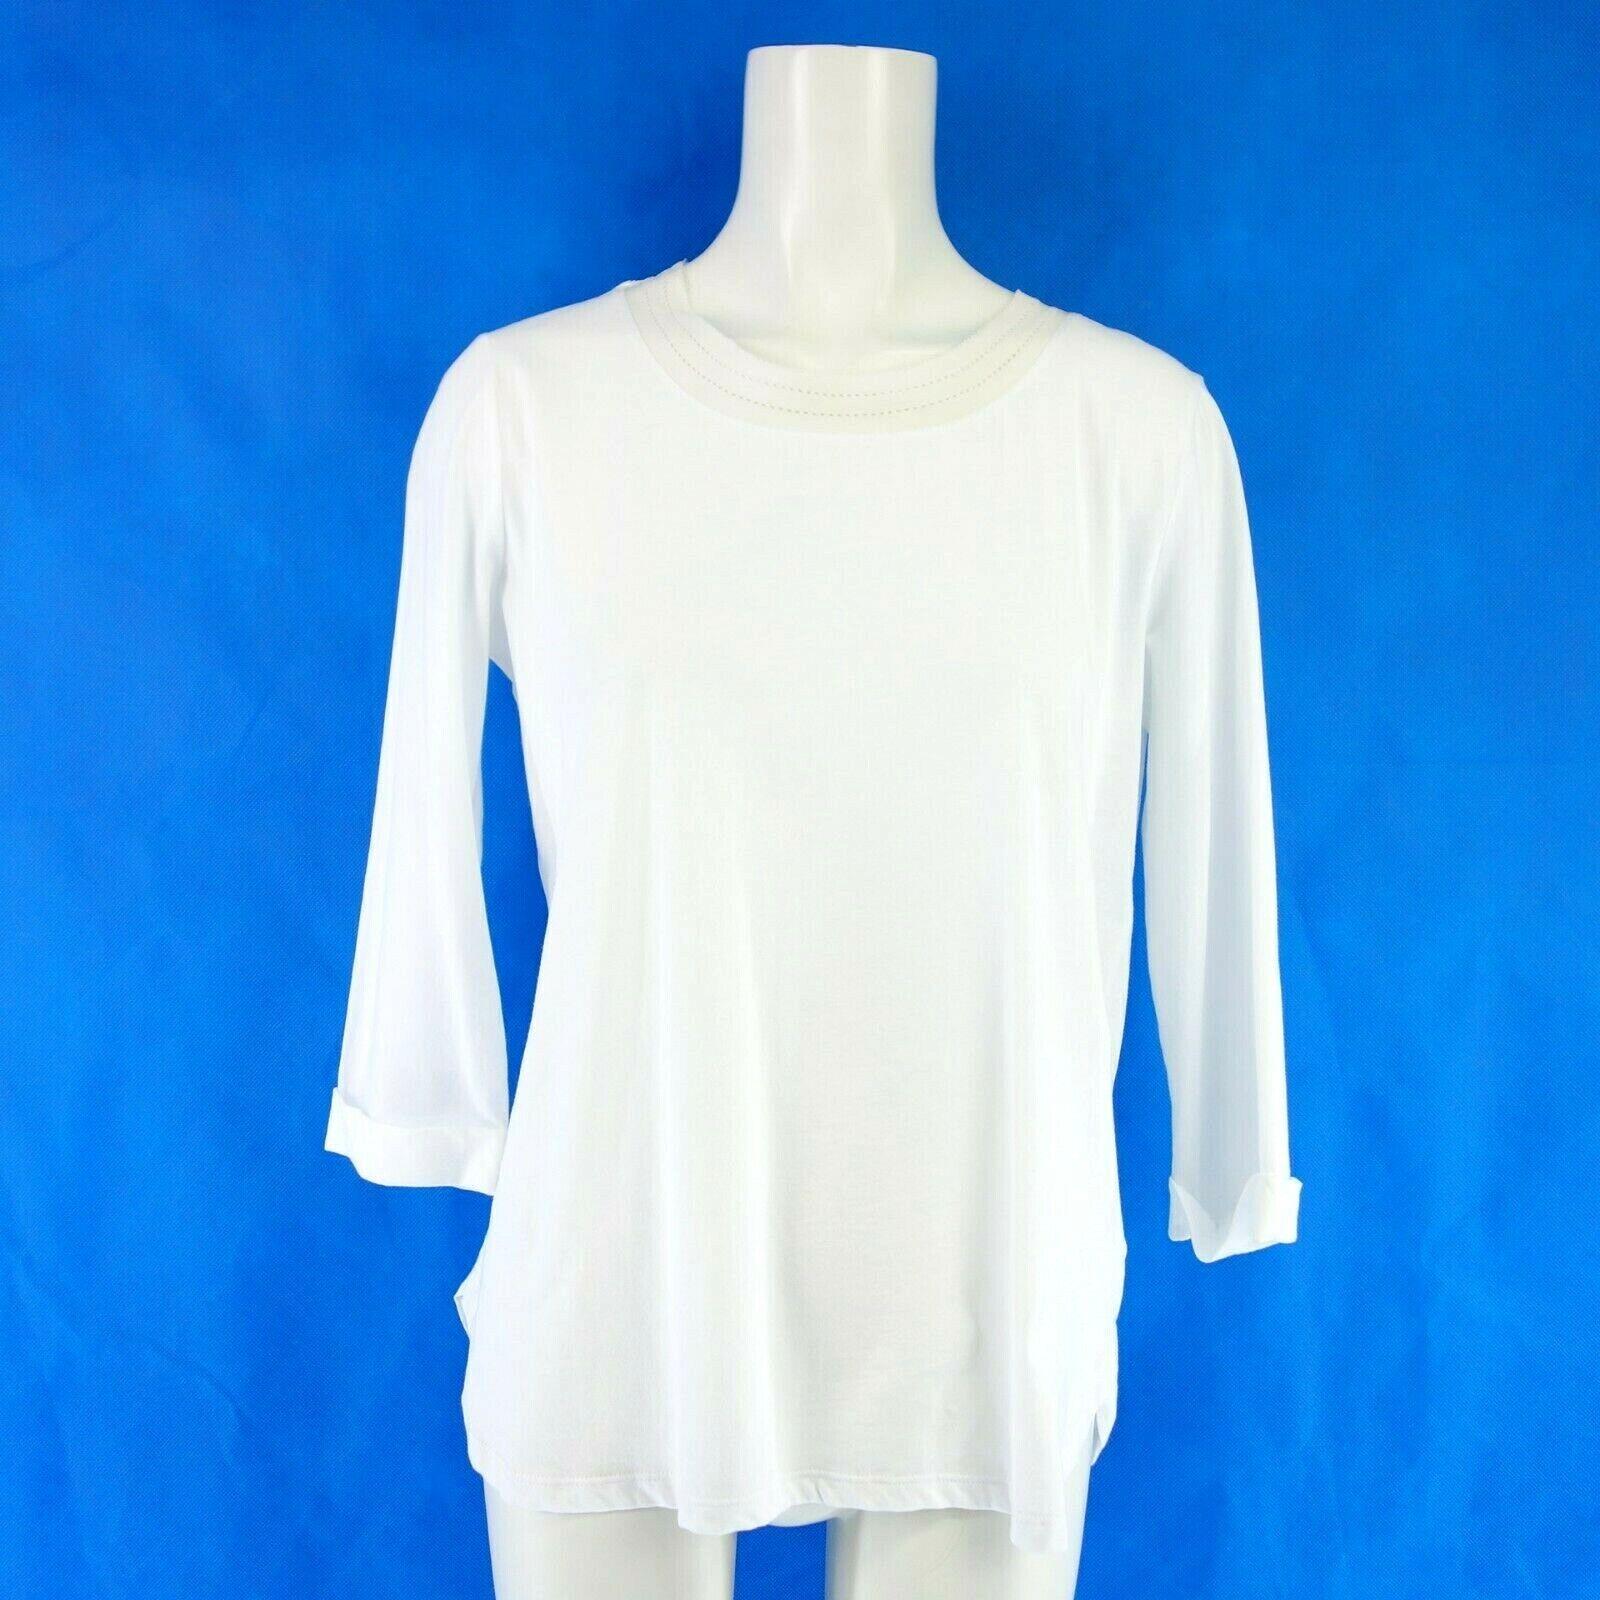 Bogner Donna Shirt Sahara 38 M Bianco Cotone Girocollo ornamentali punta NP 149 NUOVO